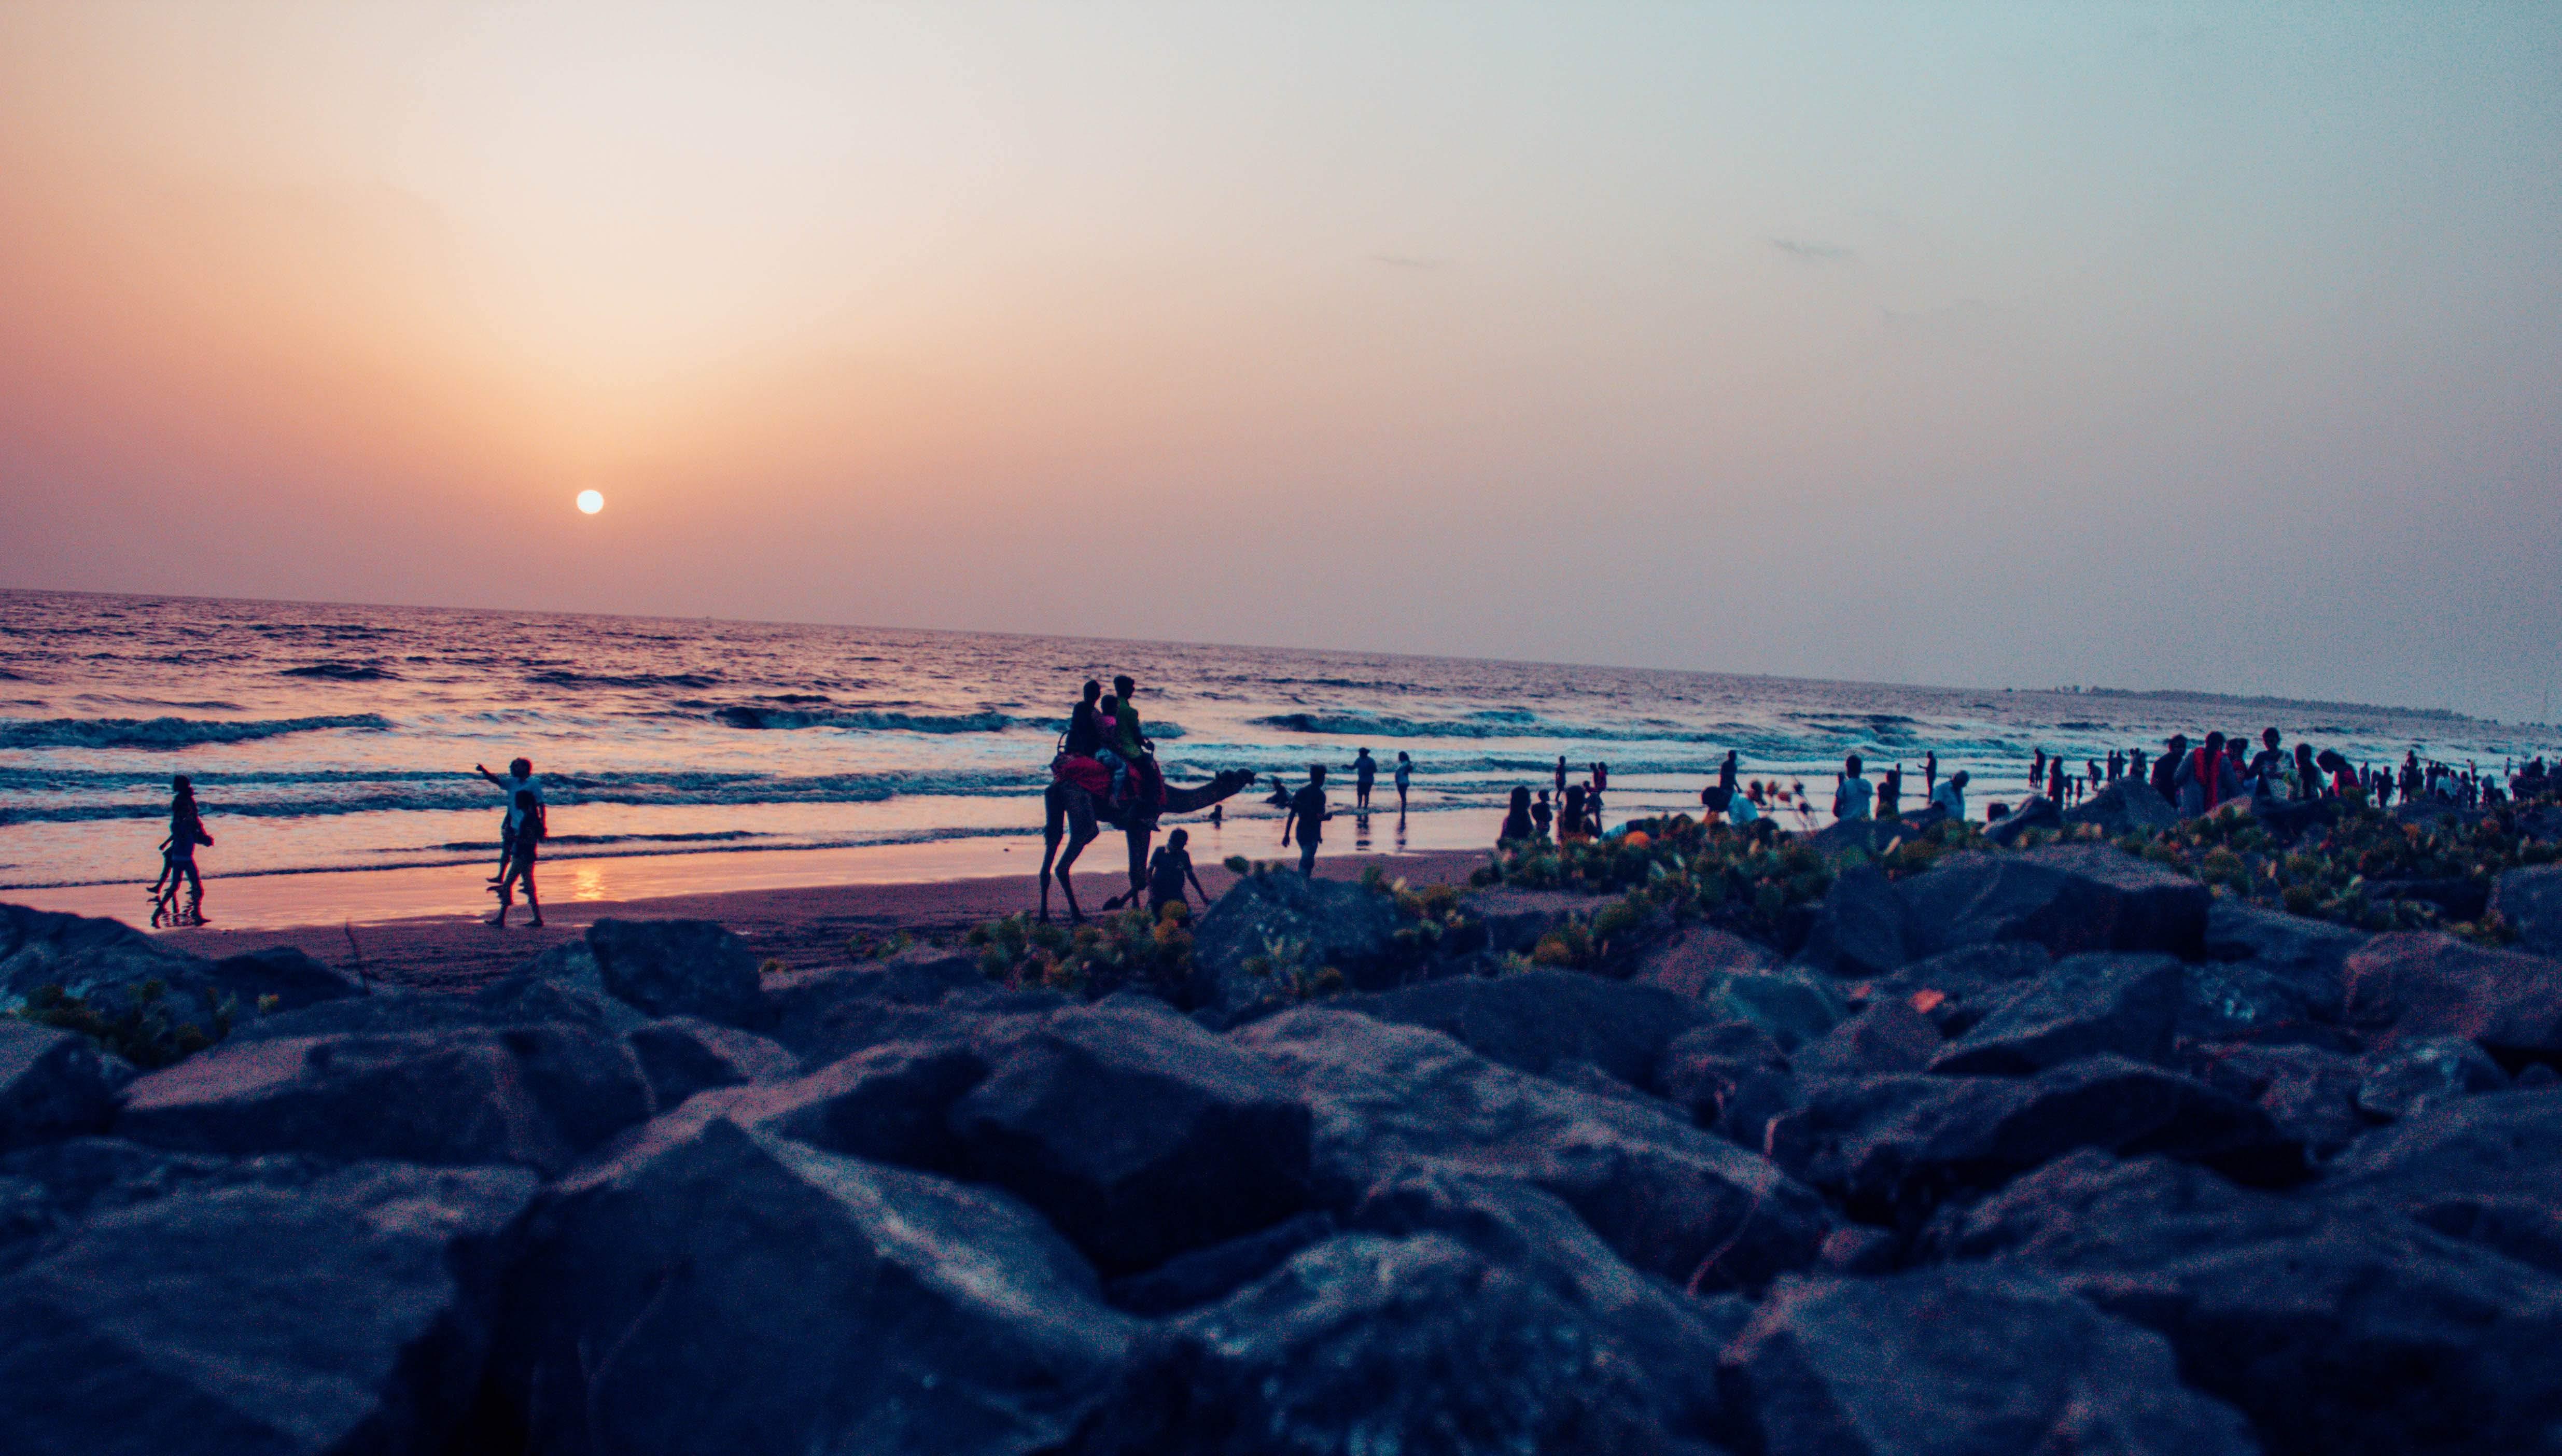 Free stock photo of beach, deep ocean, evening sky